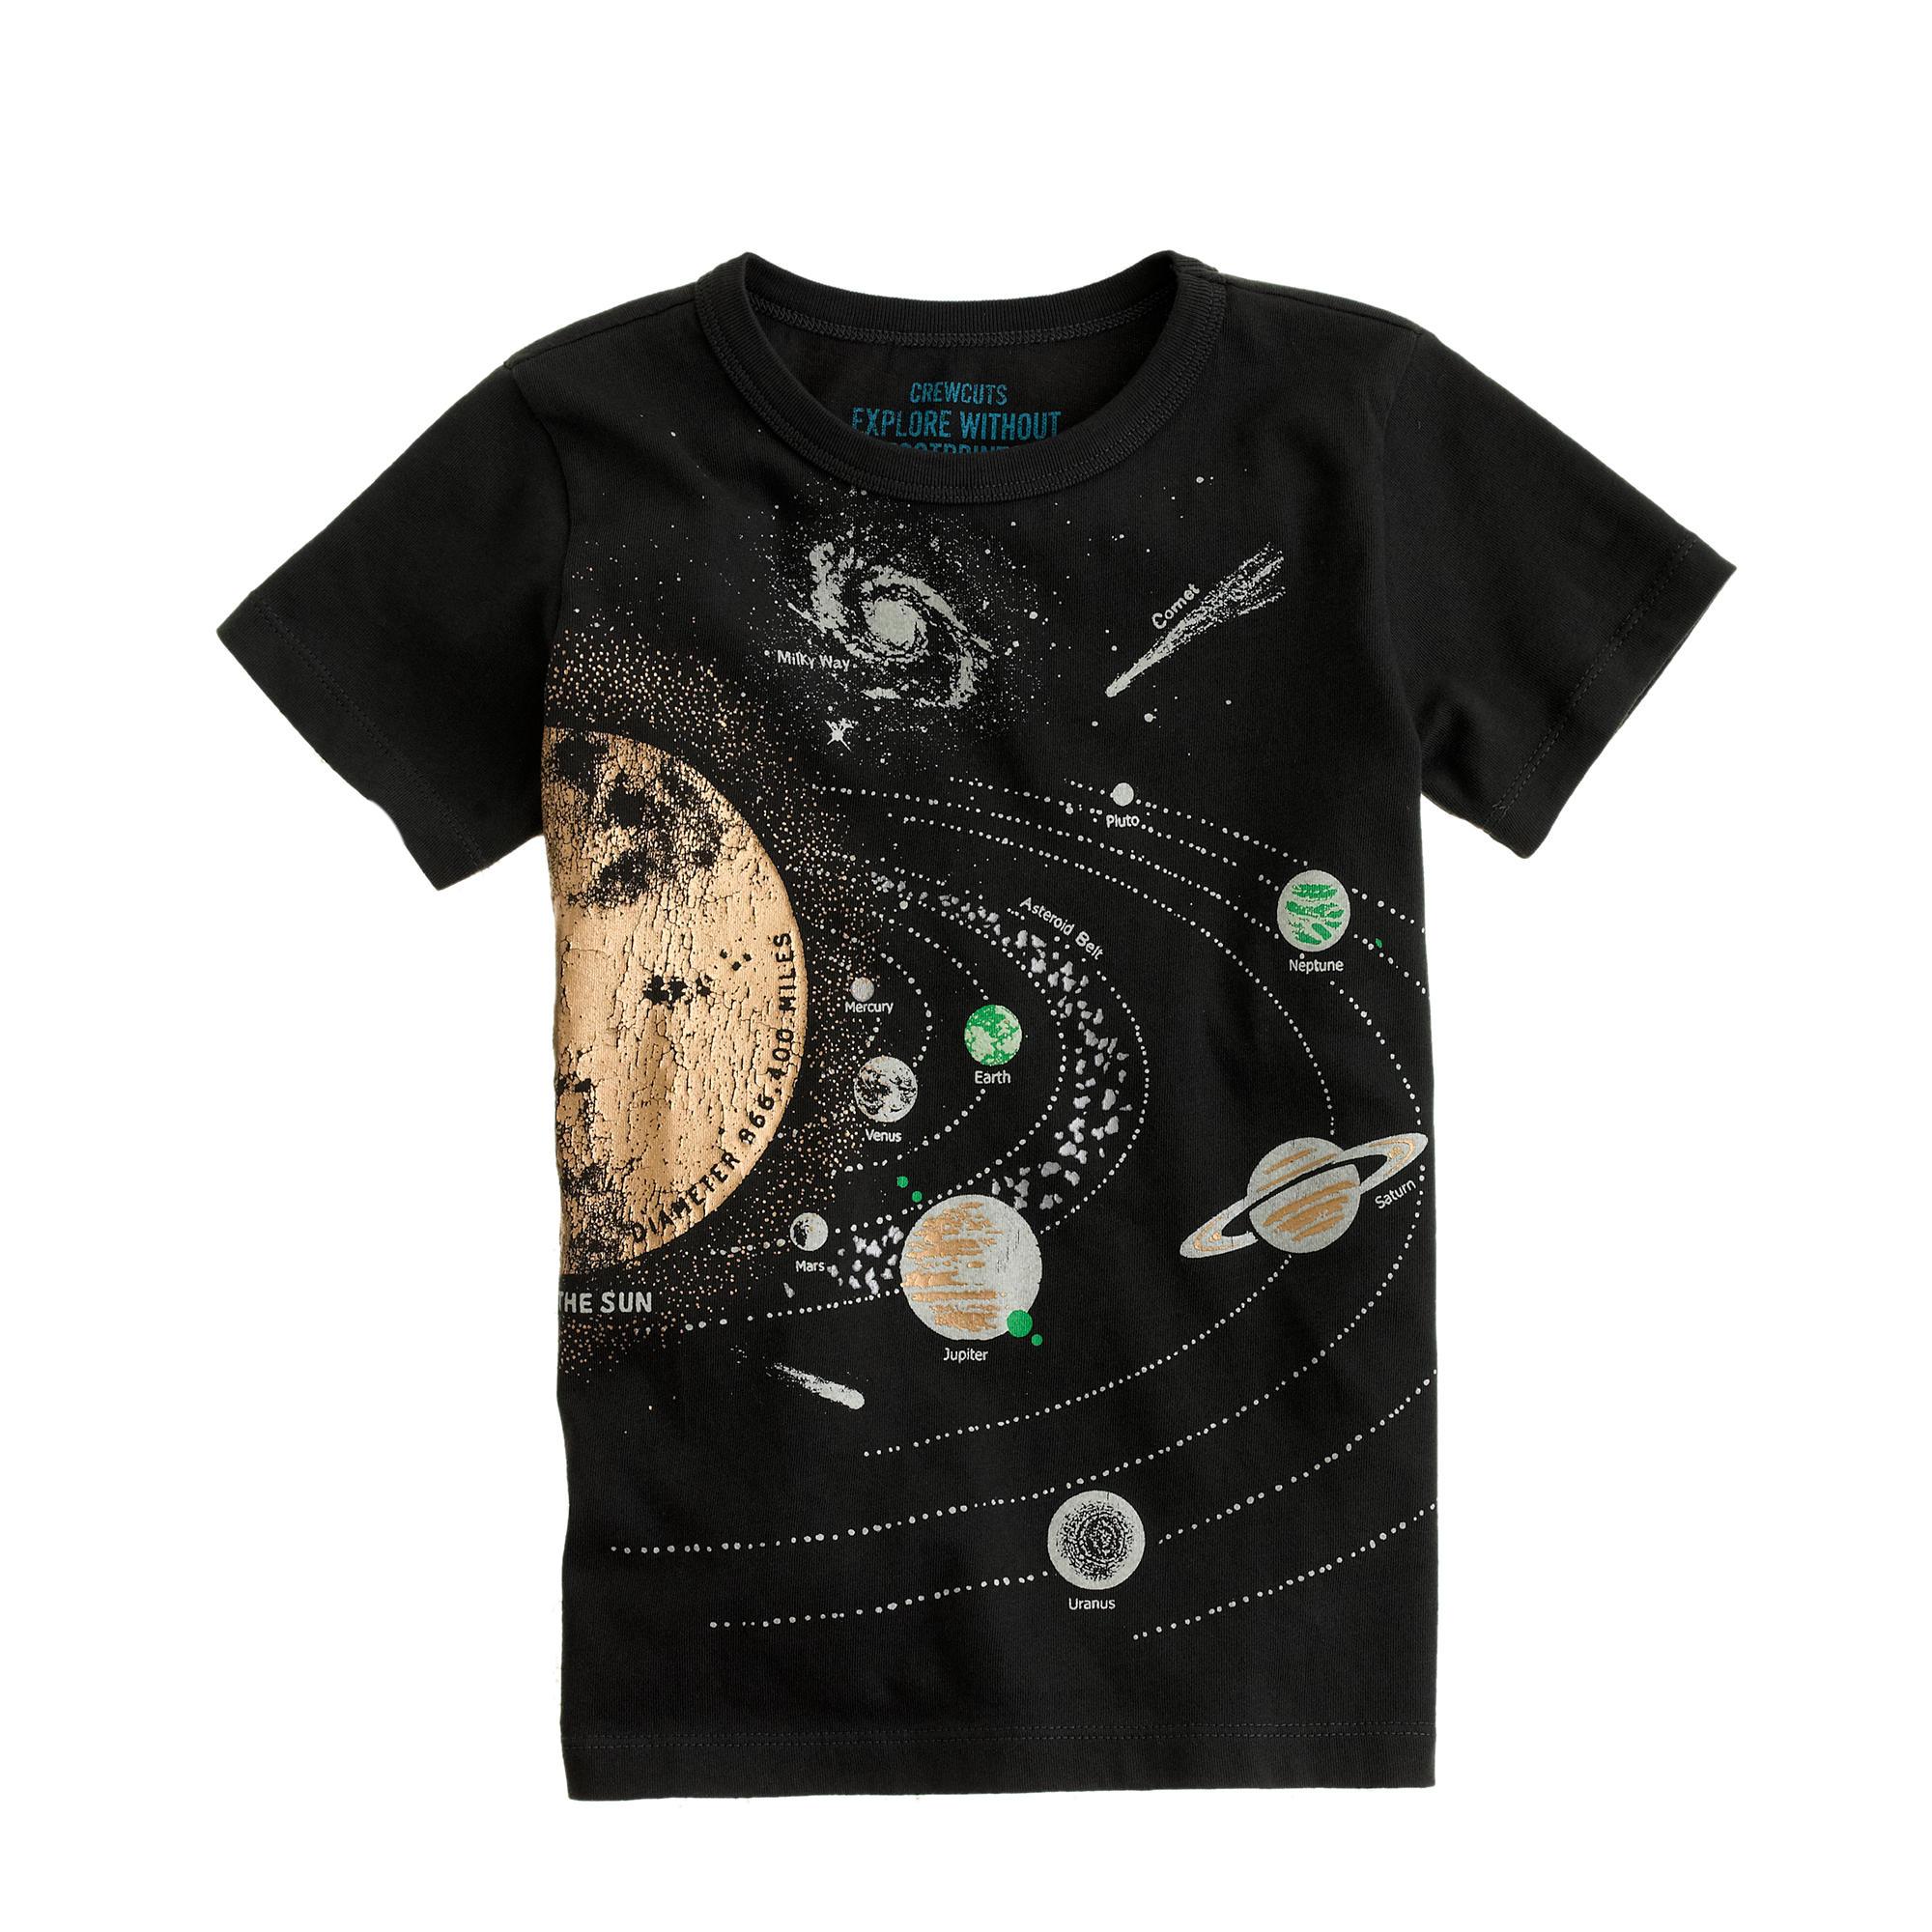 Astronomy T Shirt Design